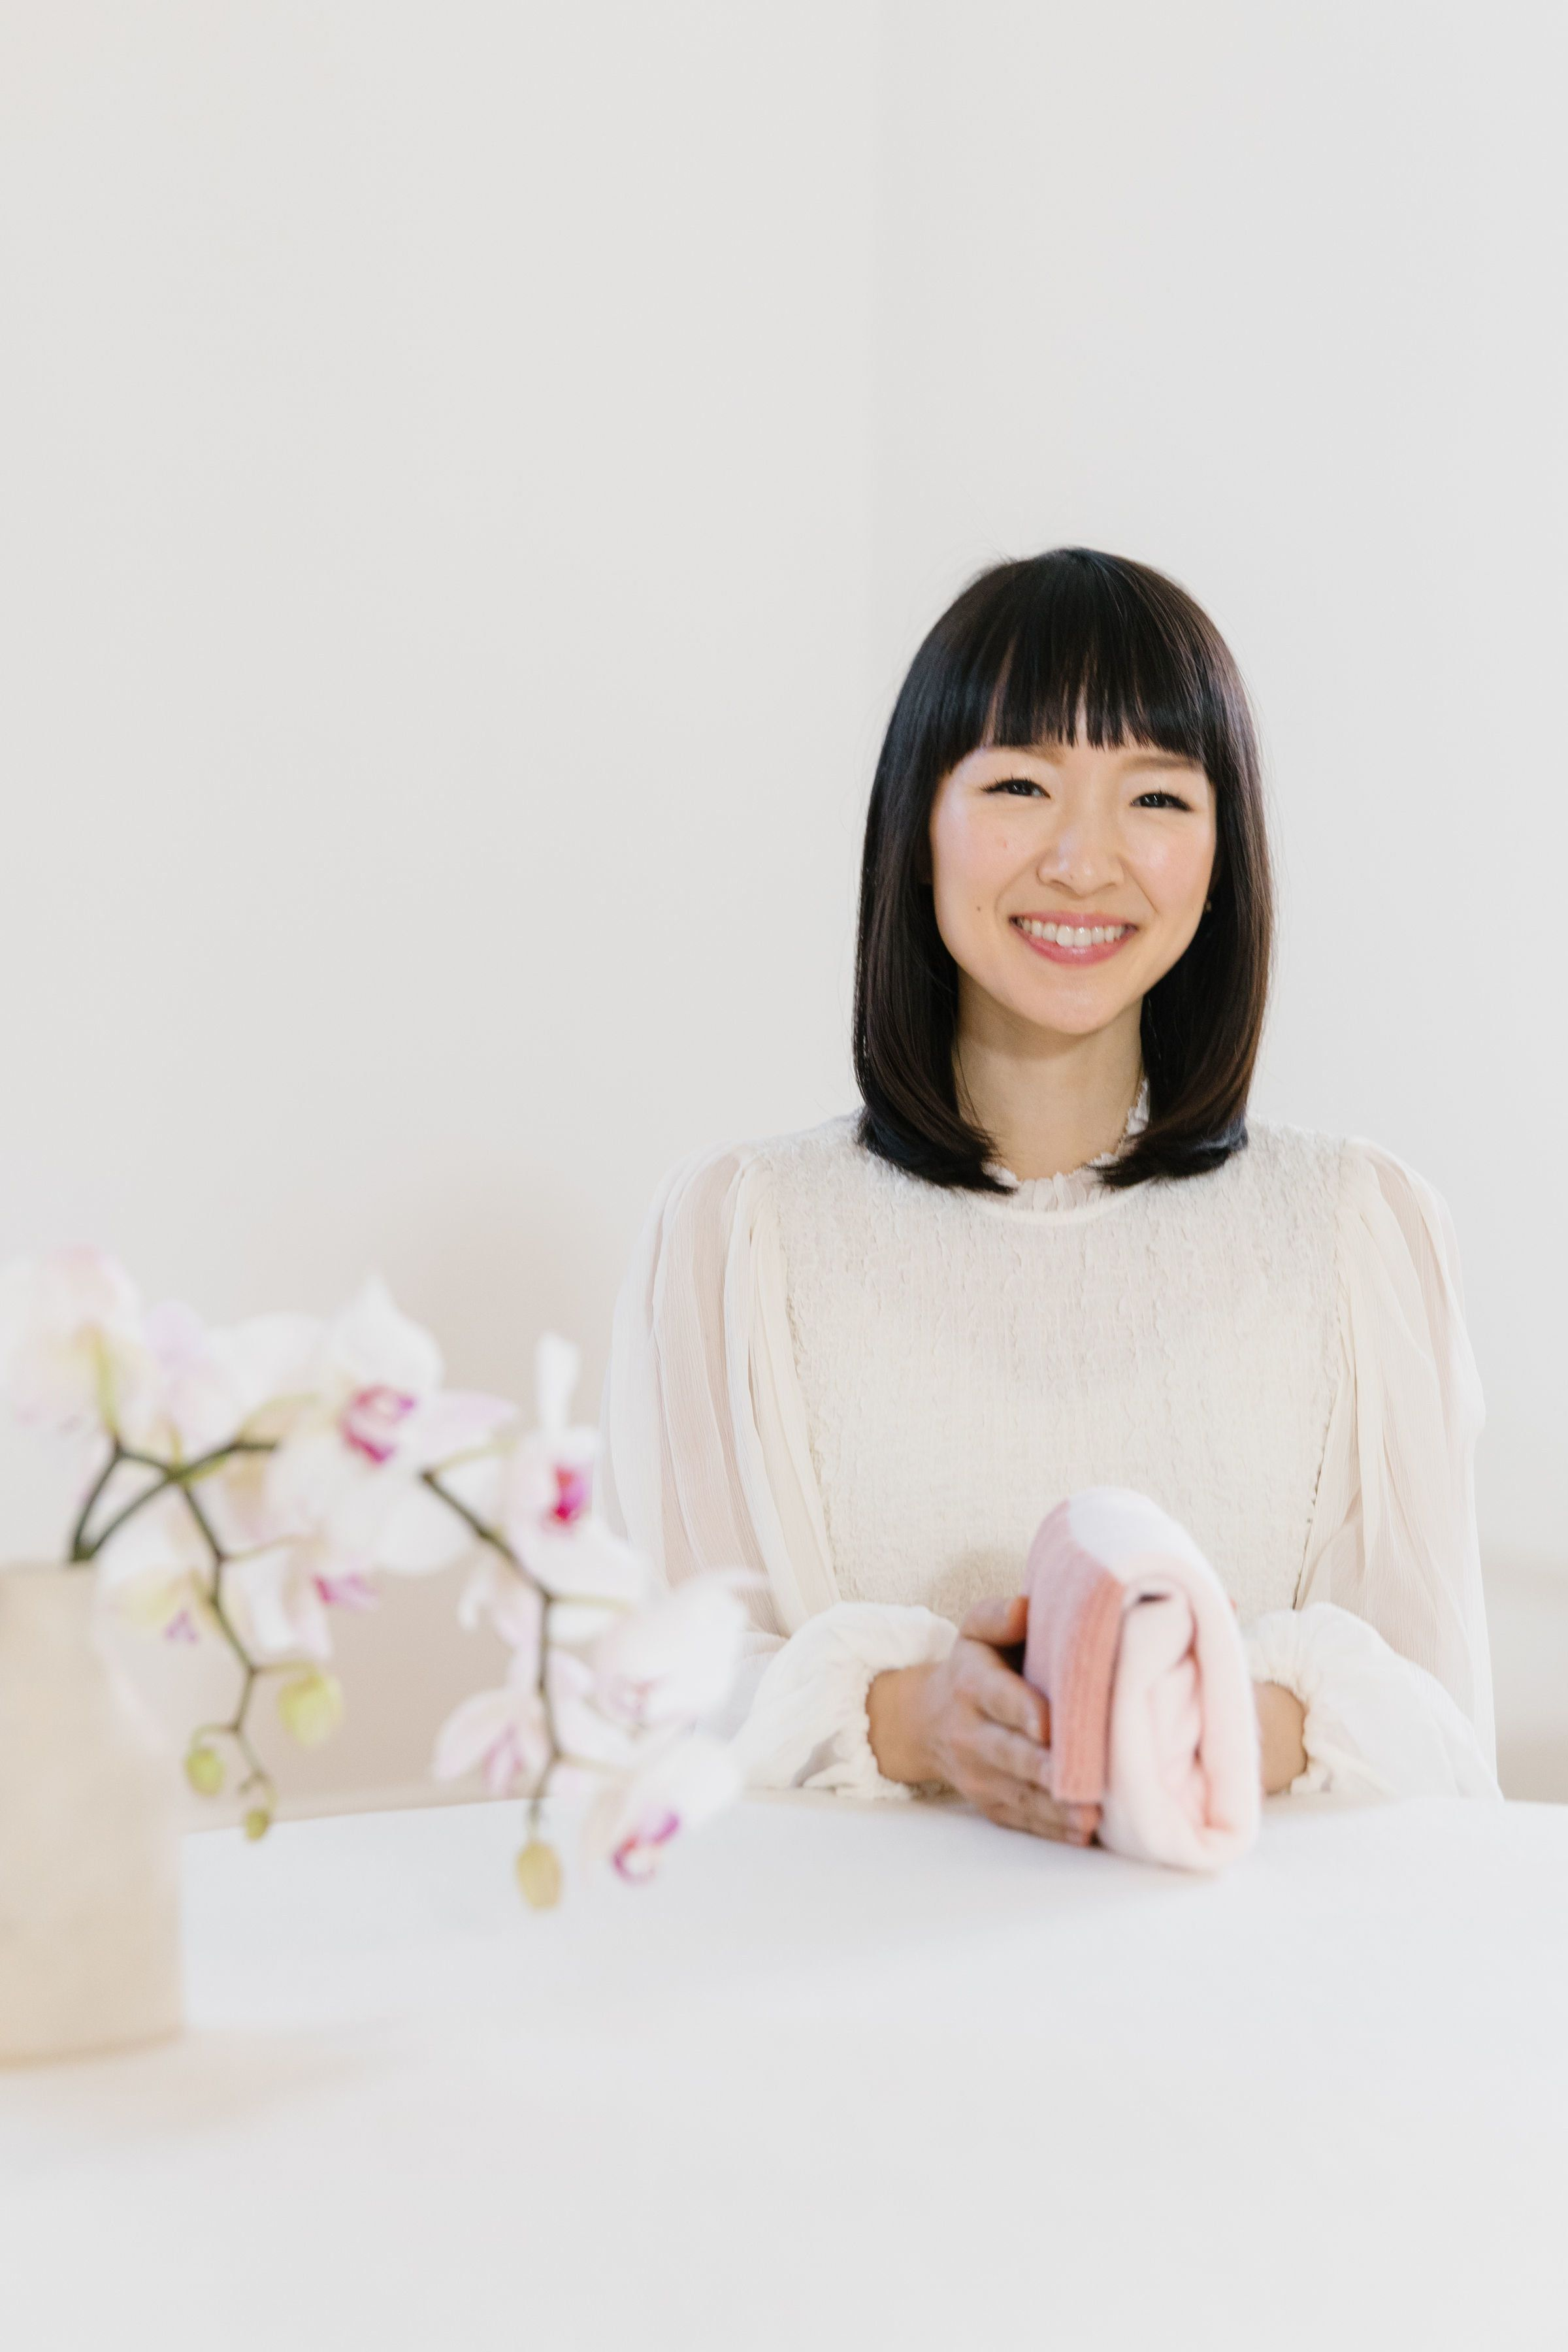 Marie Kondo's decluttering methods can tidy up your job or career, too.